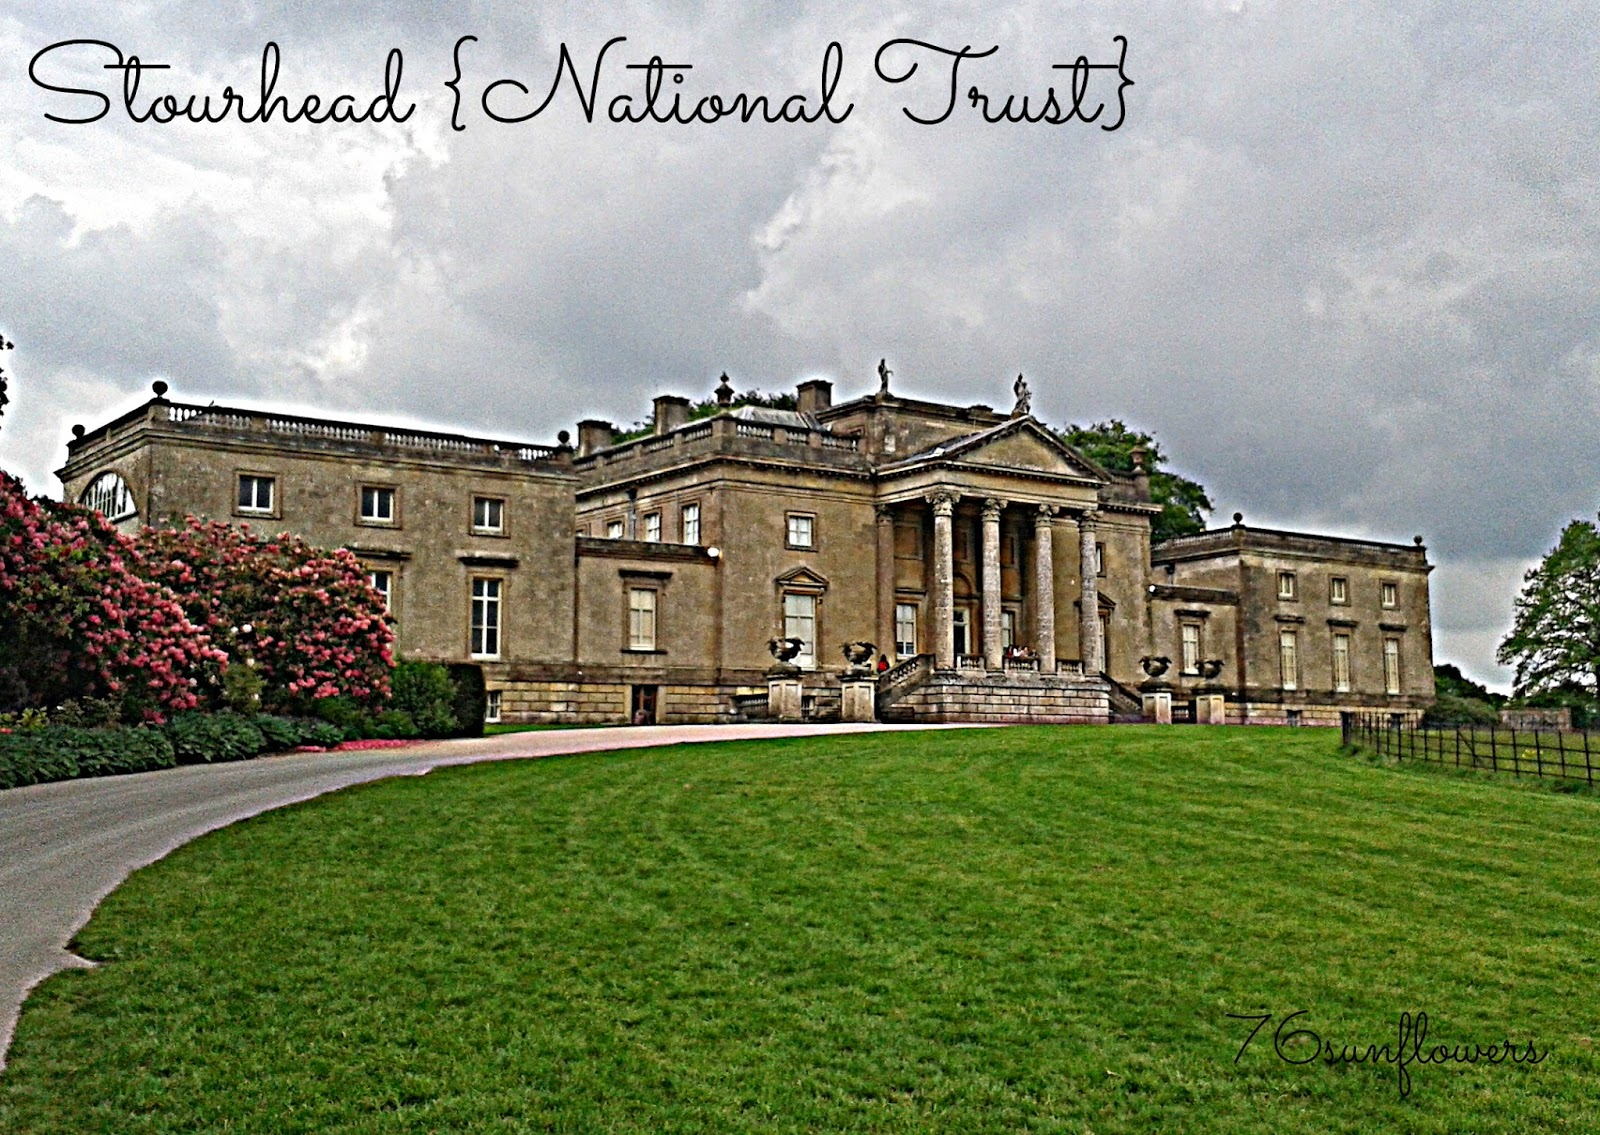 http://www.76sunflowers.co.uk/2014/05/stourhead-national-trust.html